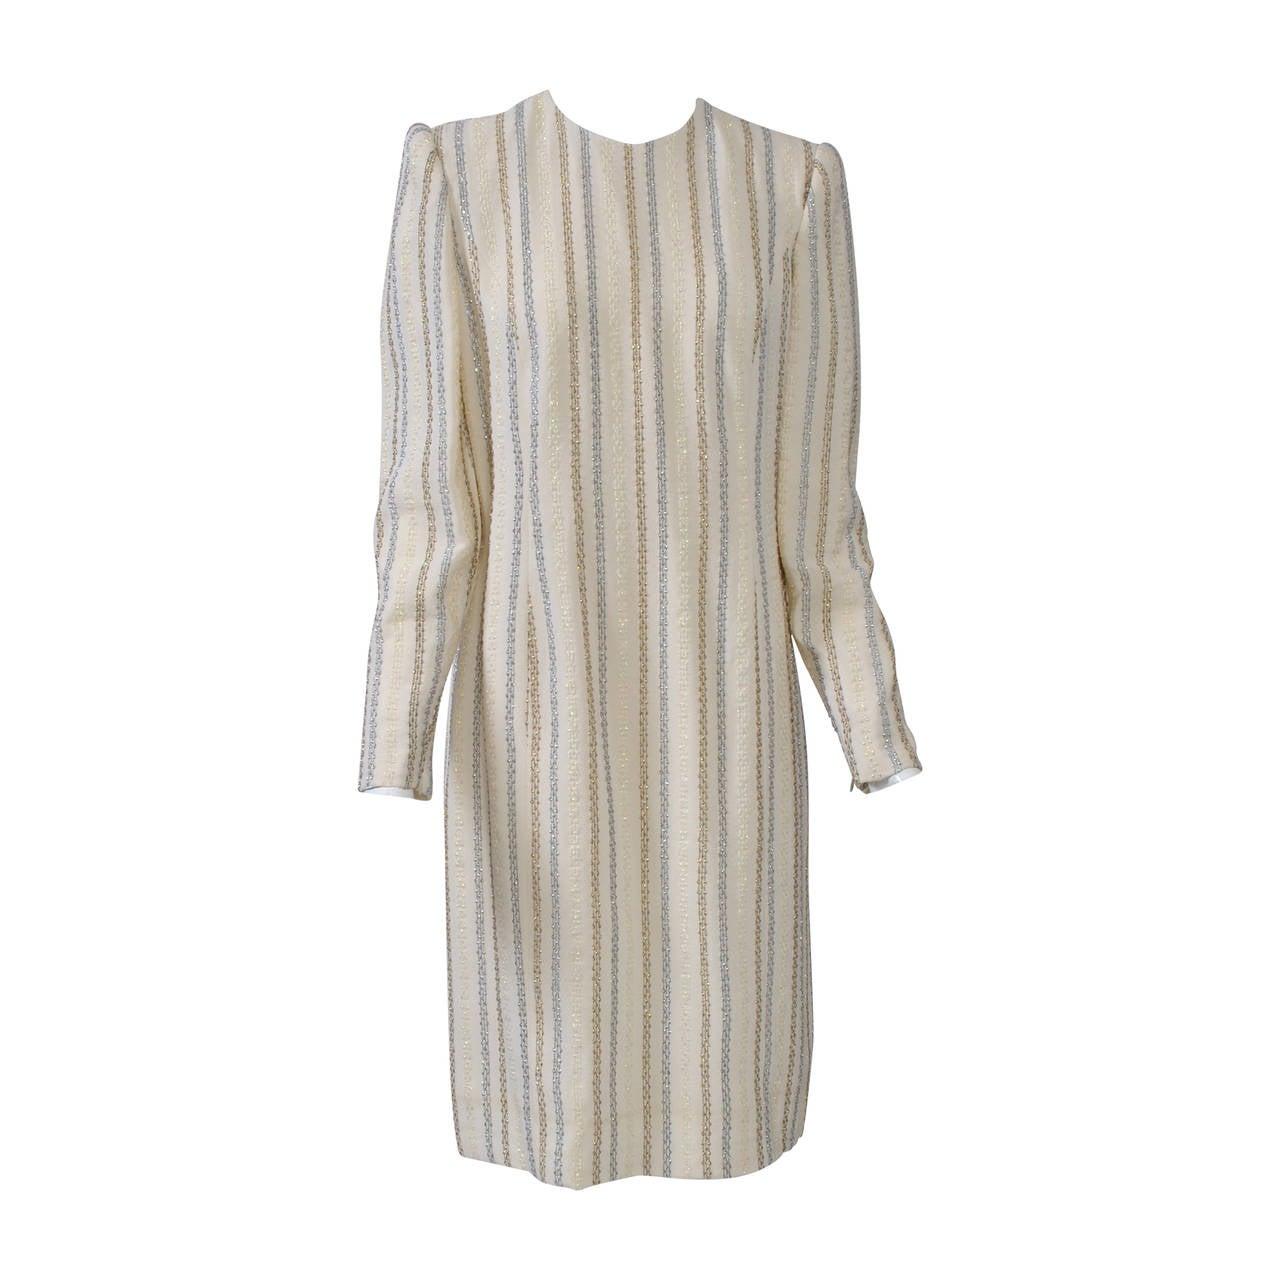 Carolina Herrera Ivory and Metallic Dress 1